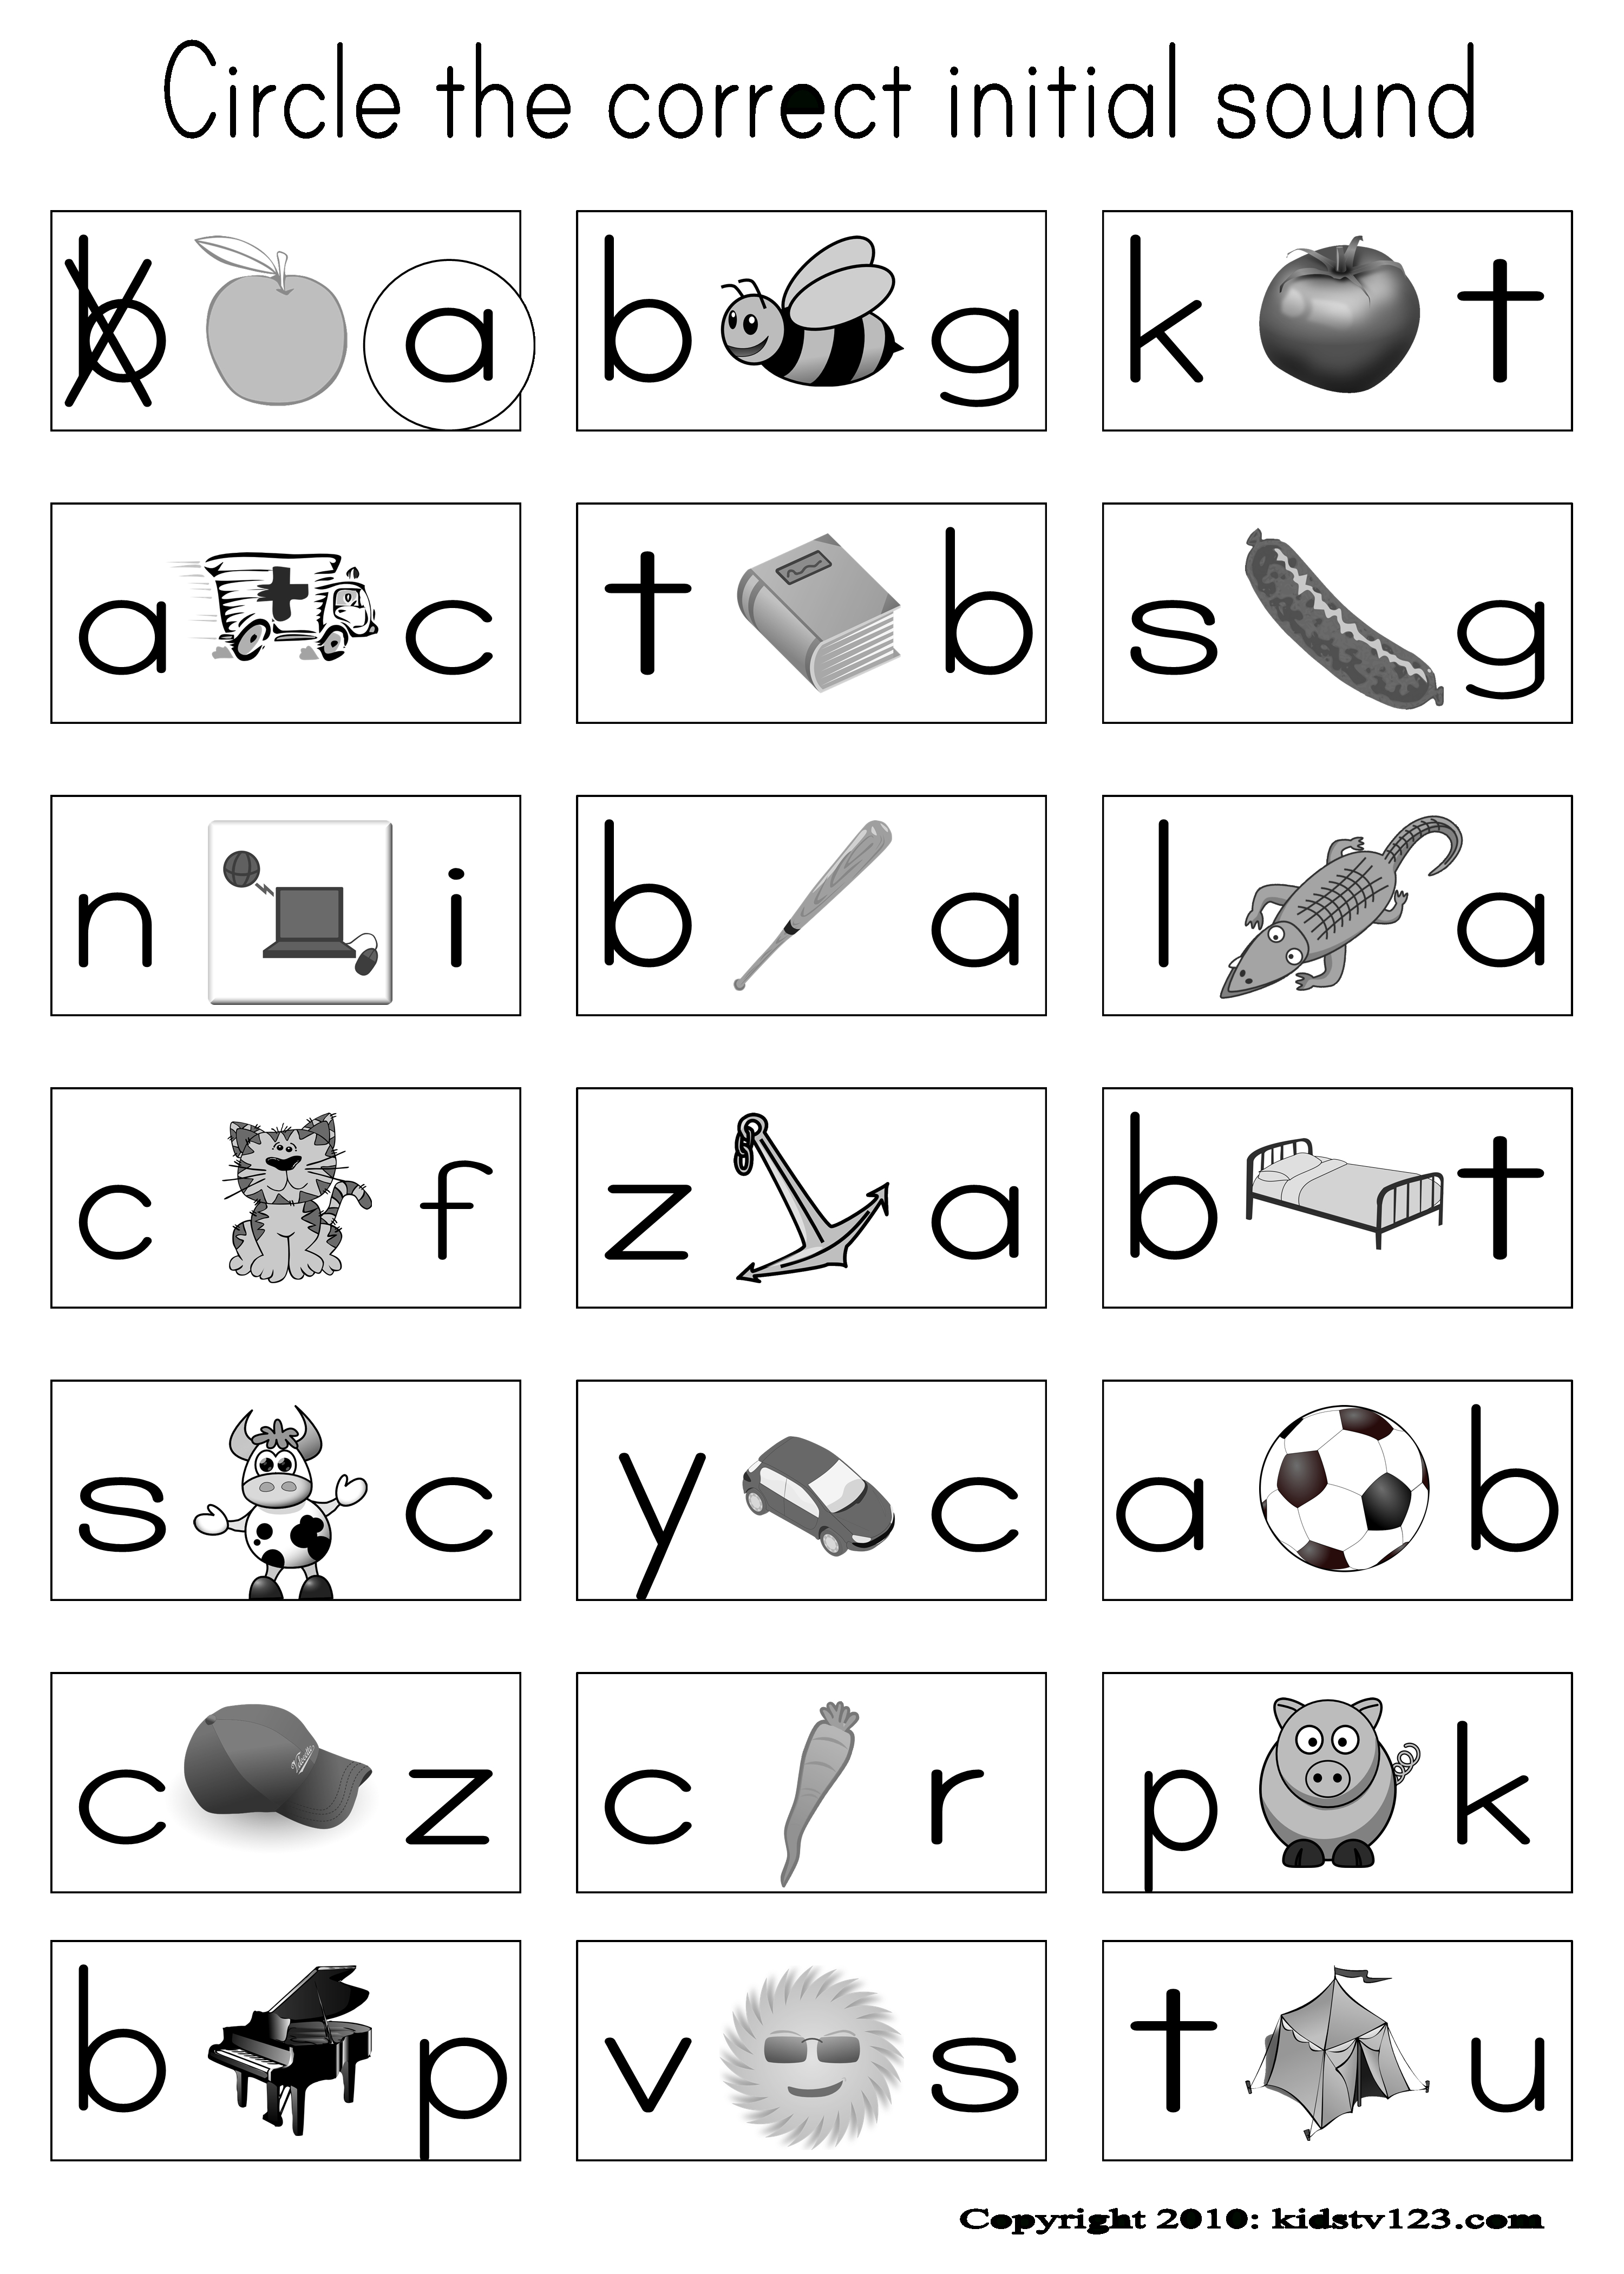 Hooked On Phonics Free Printable Worksheets